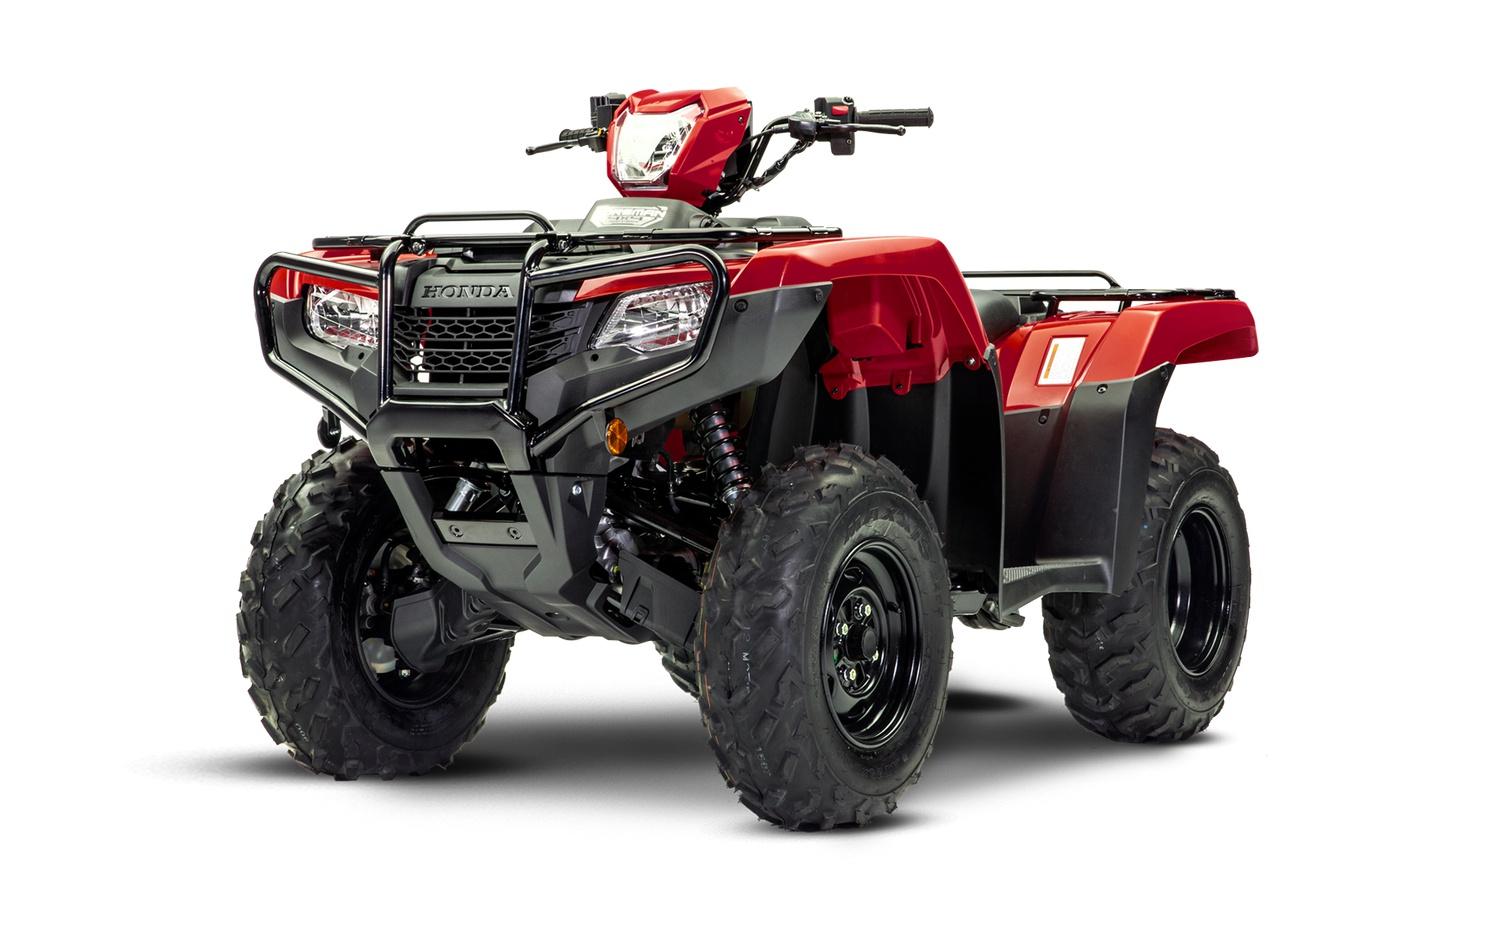 2022 Honda FOREMAN 520